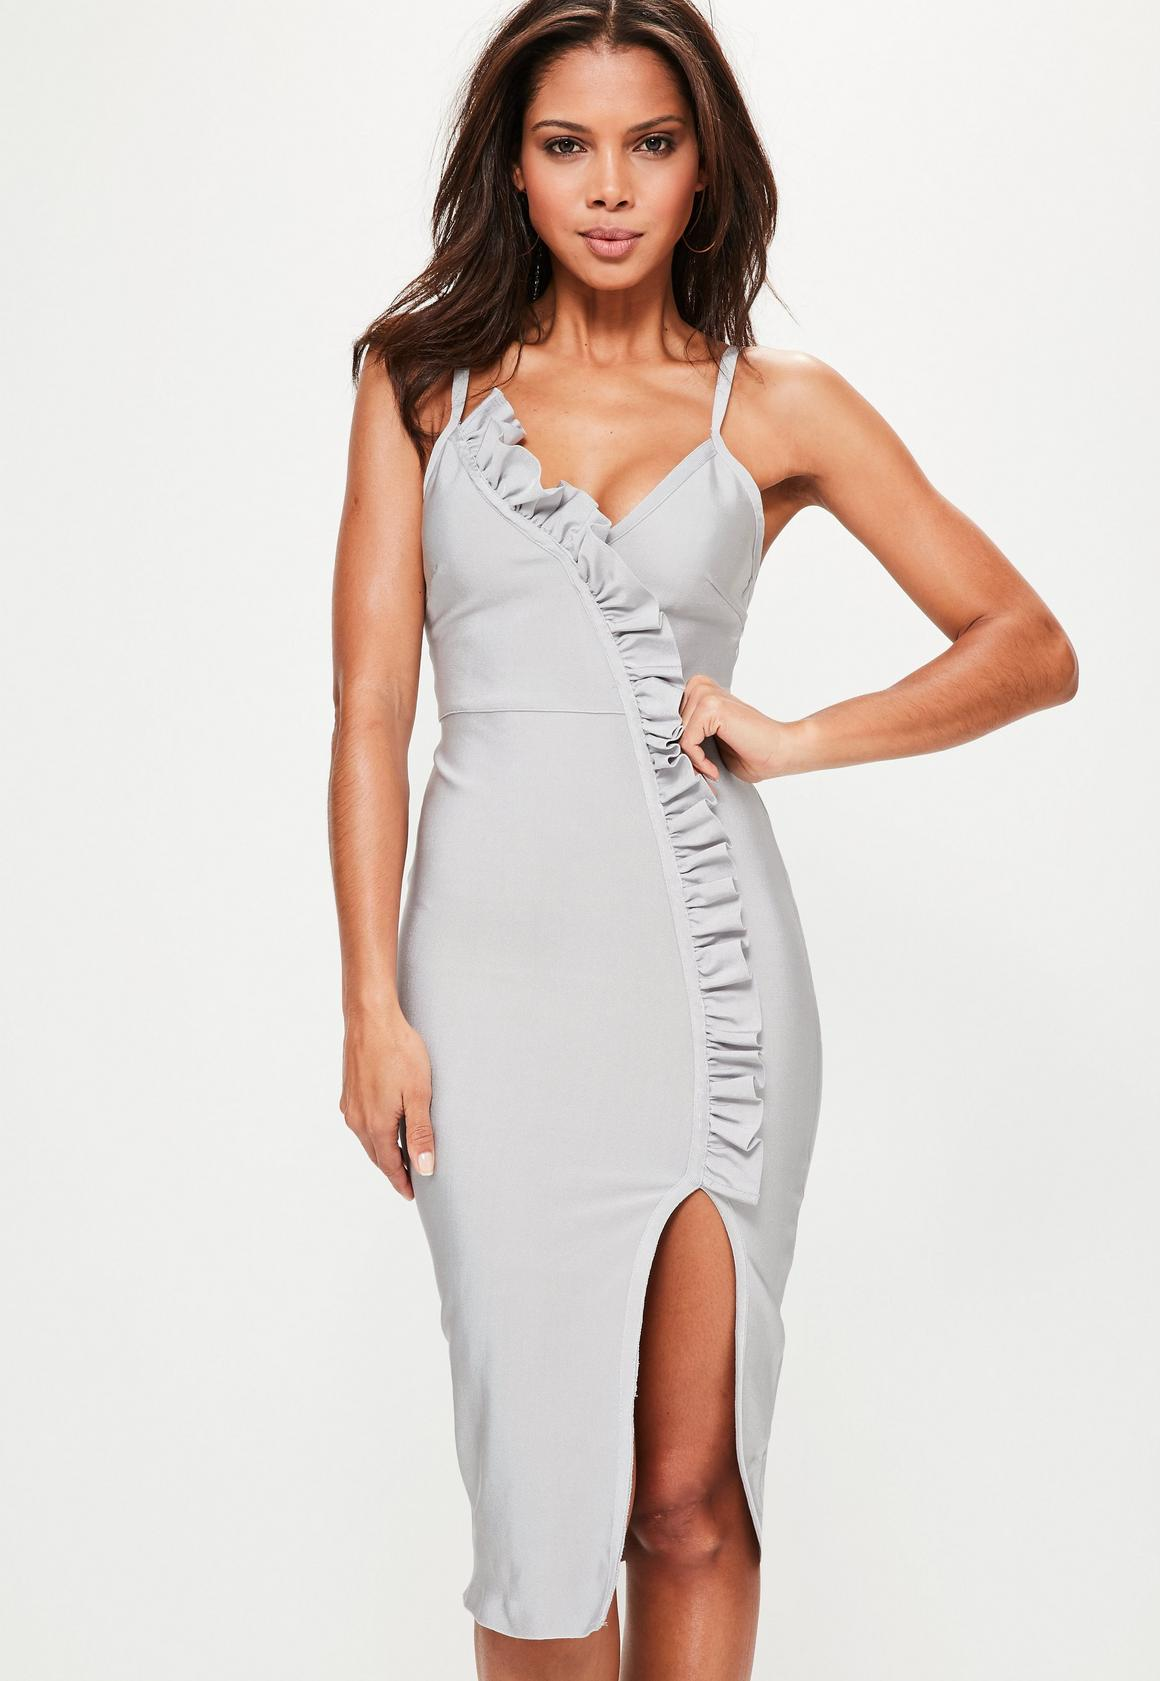 wedding guest dresses bodycon wedding dress Grey Bandage Strappy Frill Detail Midi Dress